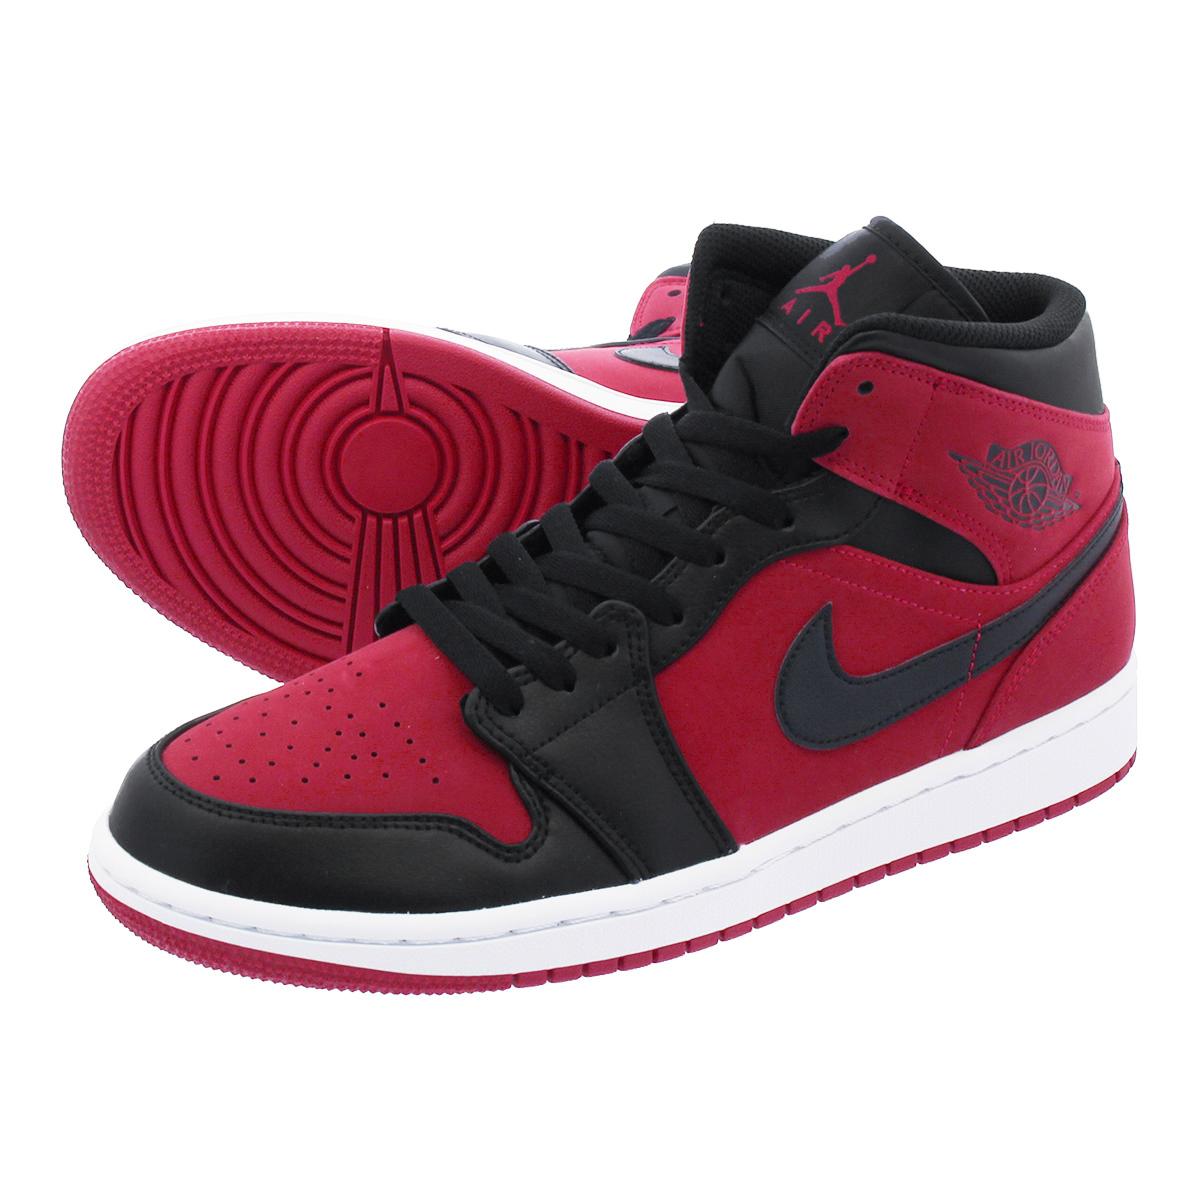 LOWTEX PLUS  NIKE AIR JORDAN 1 MID Nike Air Jordan 1 mid GYM RED ... 905f6d49e0e0